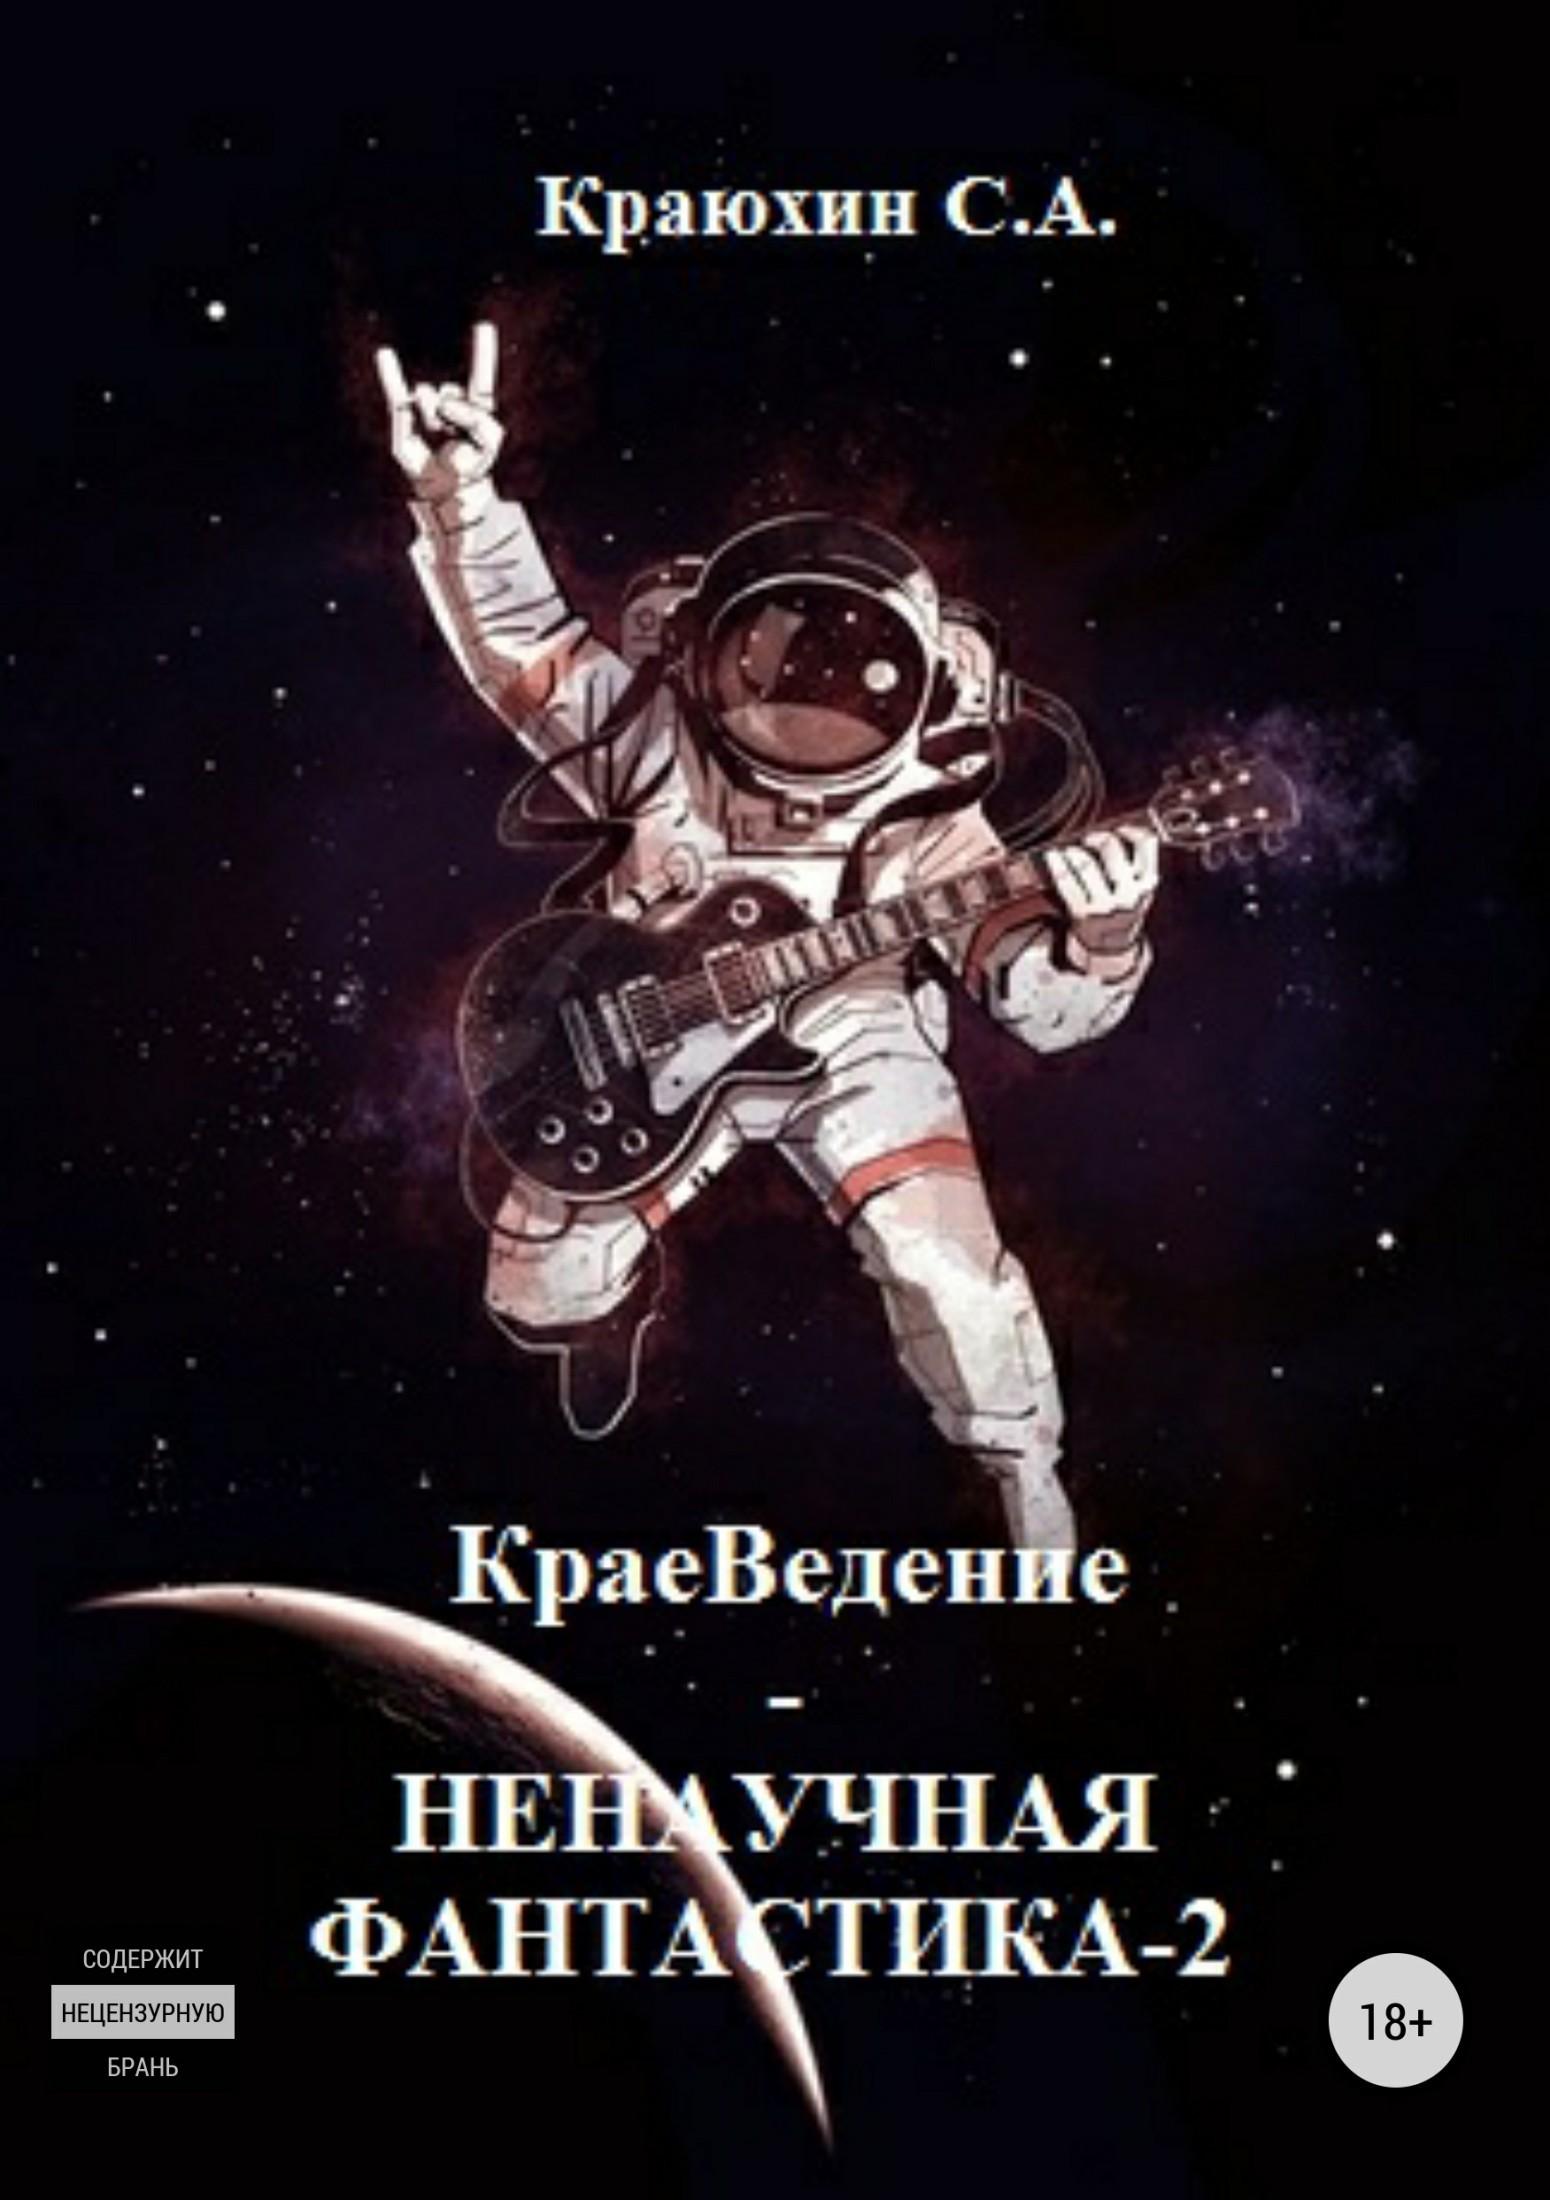 Сергей Александрович Краюхин бесплатно